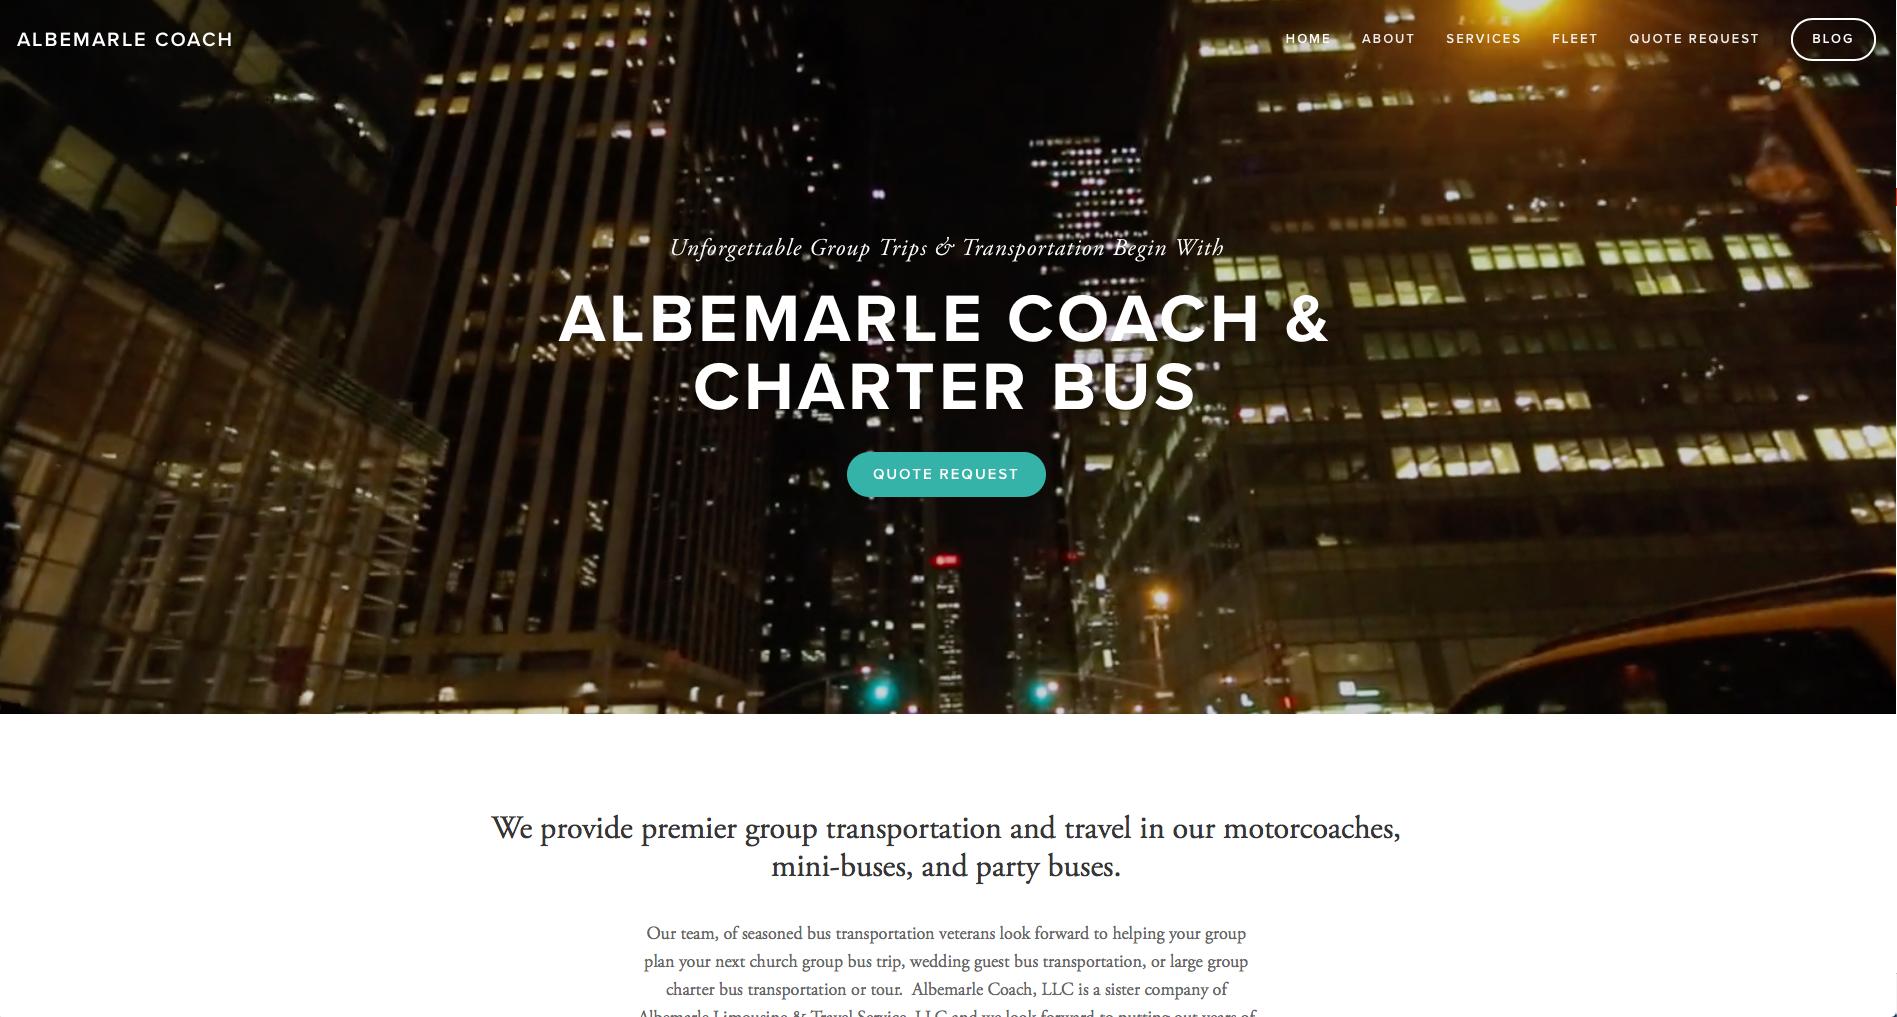 Website Design - Albemarle Coaches